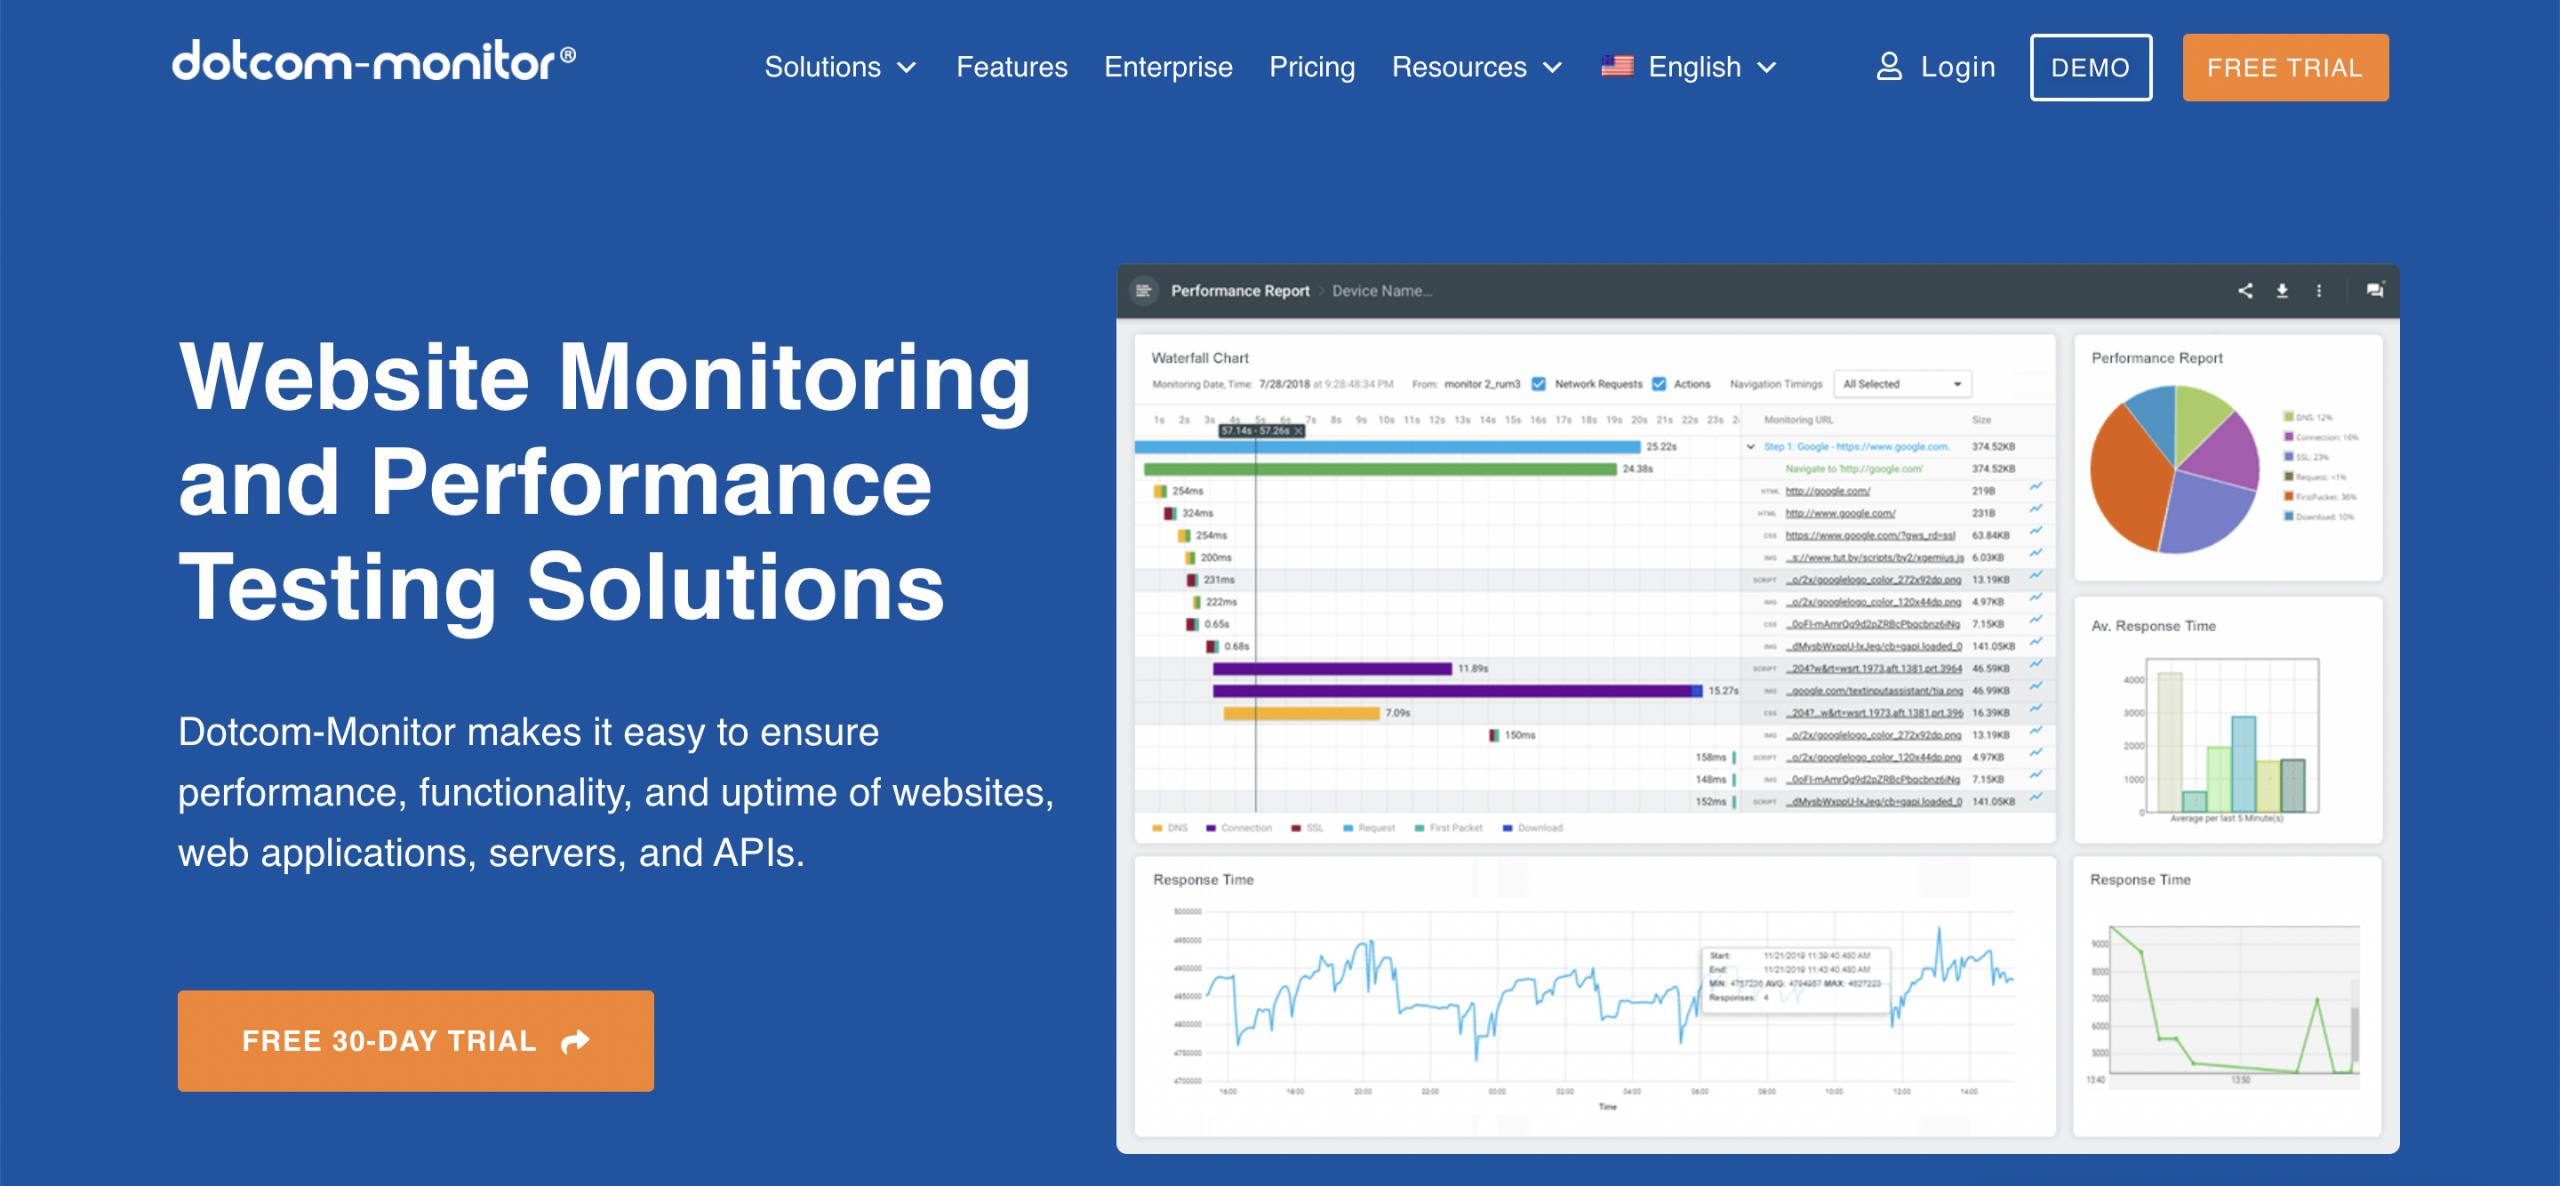 Dotcom-Monitor - Top 10 Best Website Monitoring Services of 2021 - HostNamaste